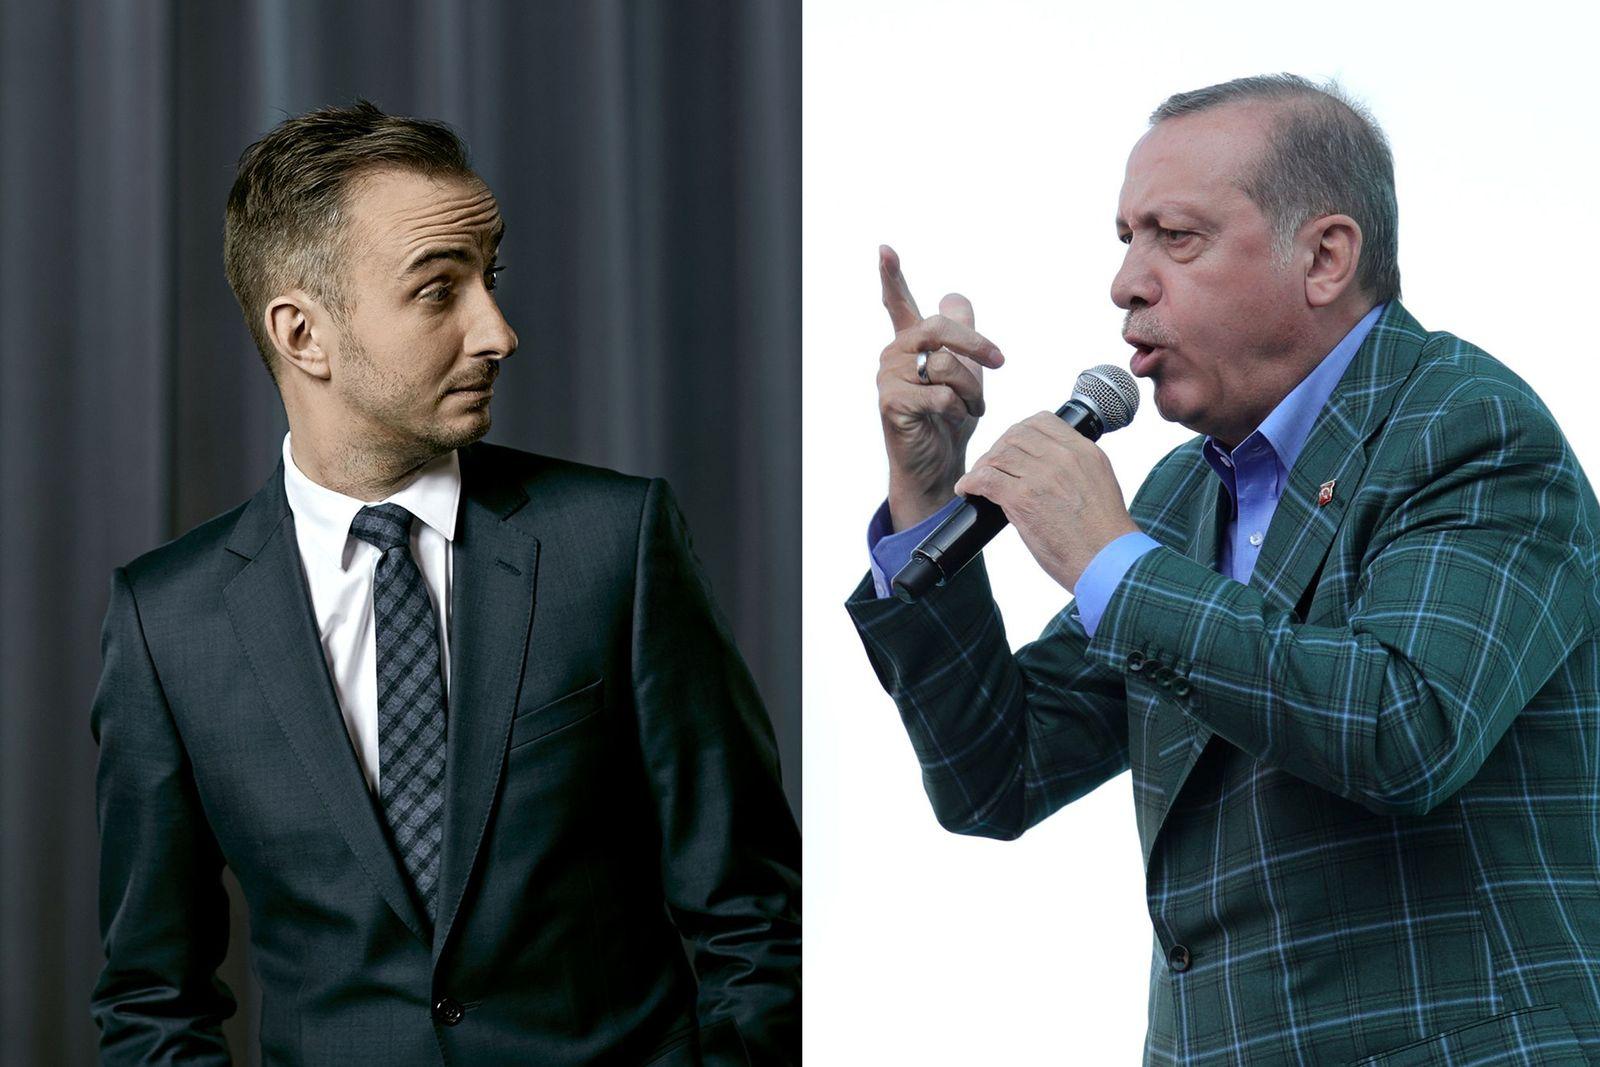 EINMALIGE VERWENDUNG Böhmermann vs. Erdogan KOMBO